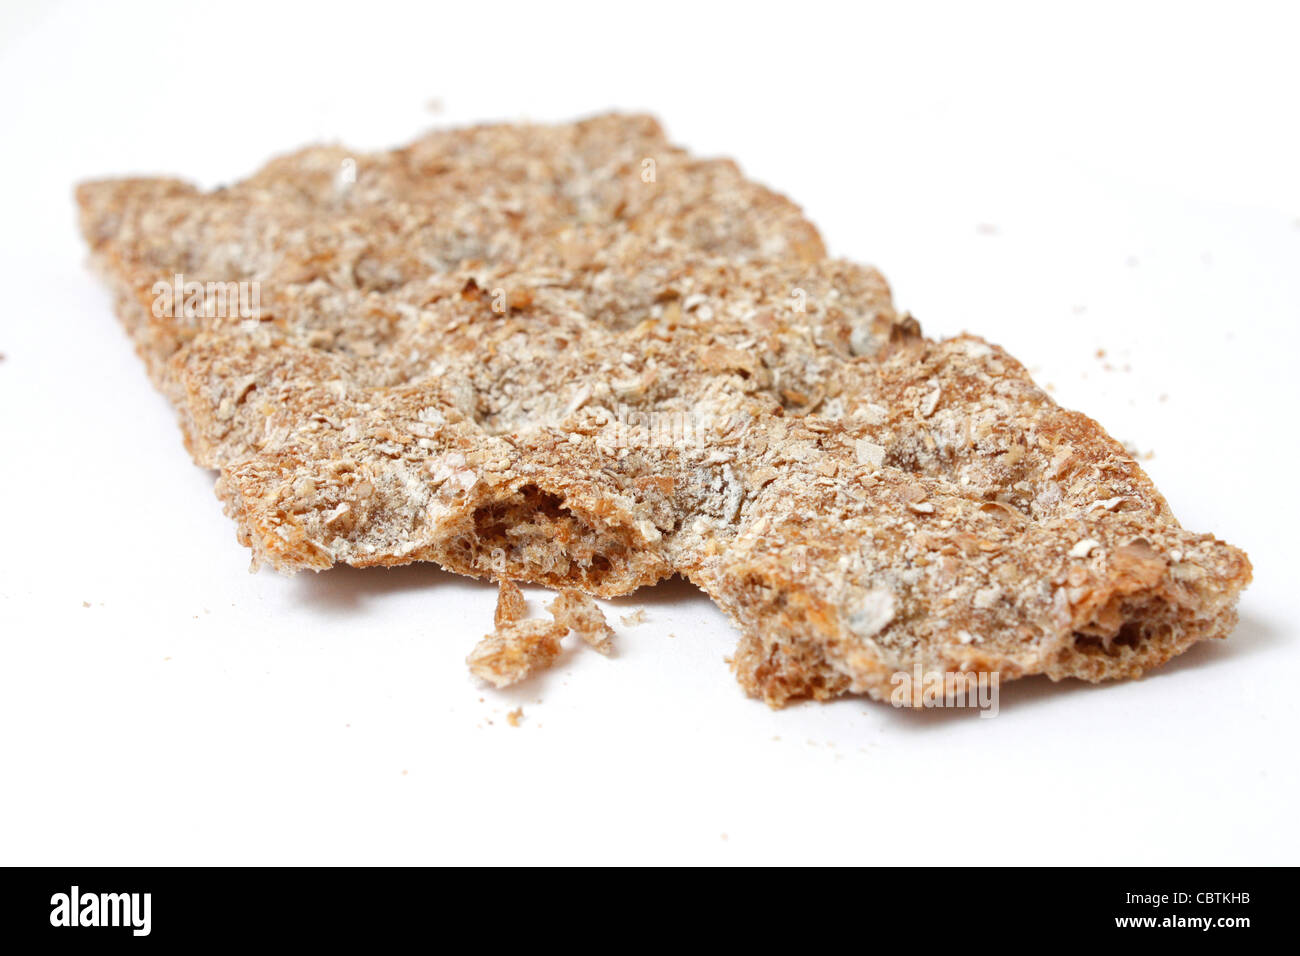 swedish crispbread isolated on white - Stock Image